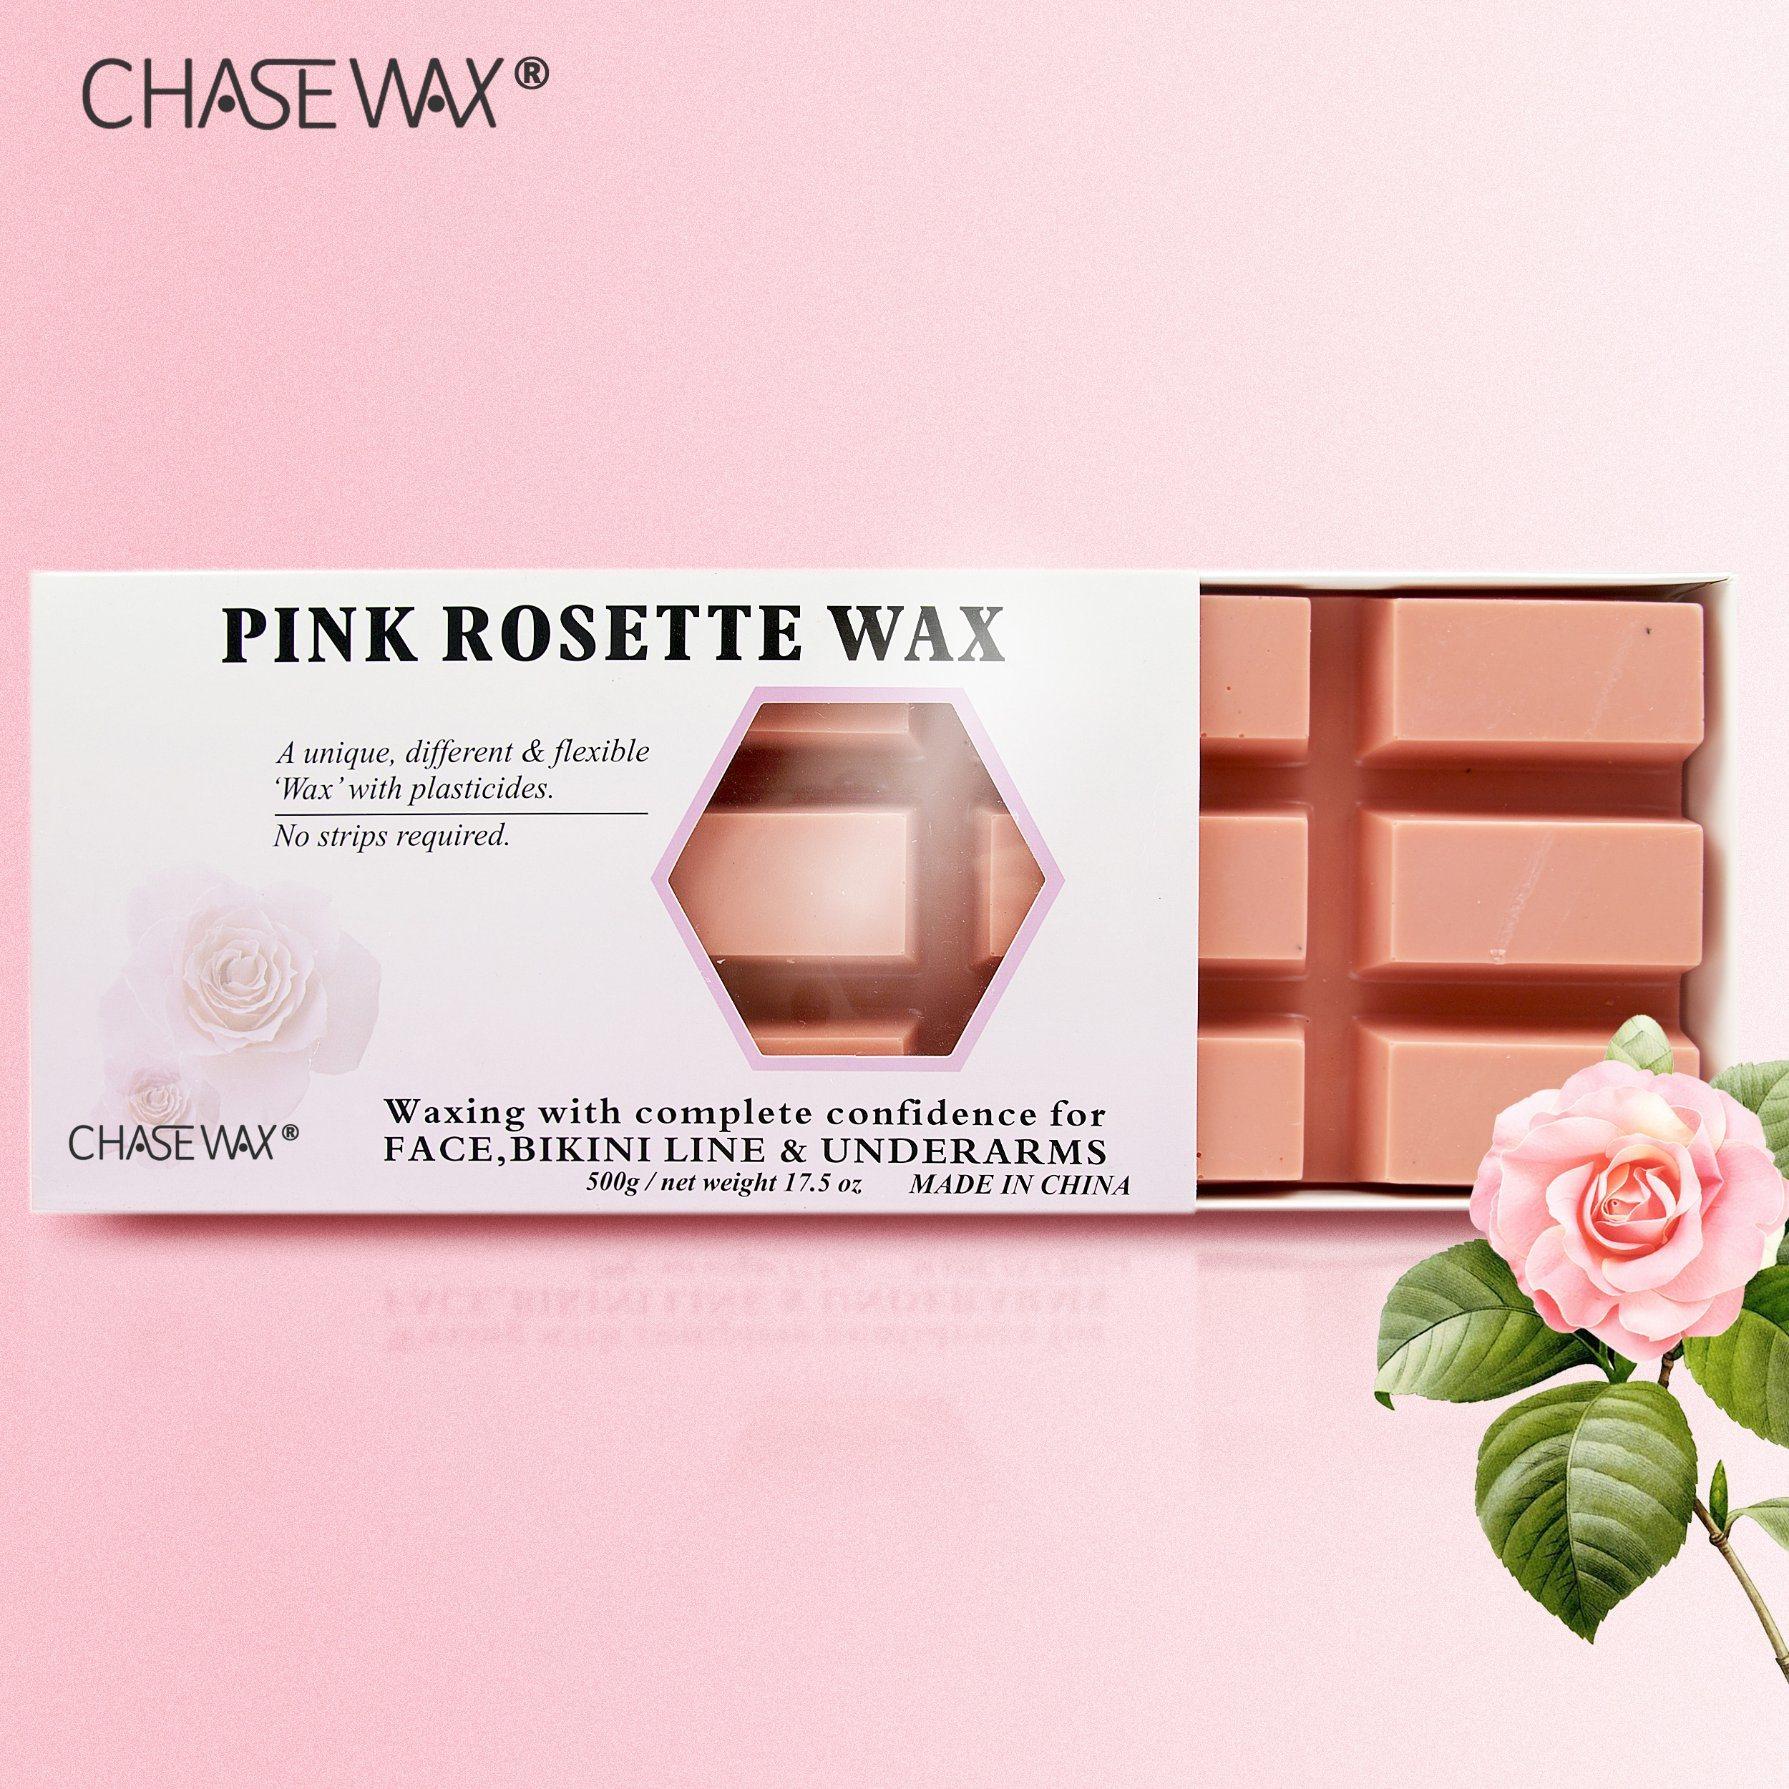 China Deep Cleaning 500g Rose Pink Depilatory Wax Beauty Hard Wax